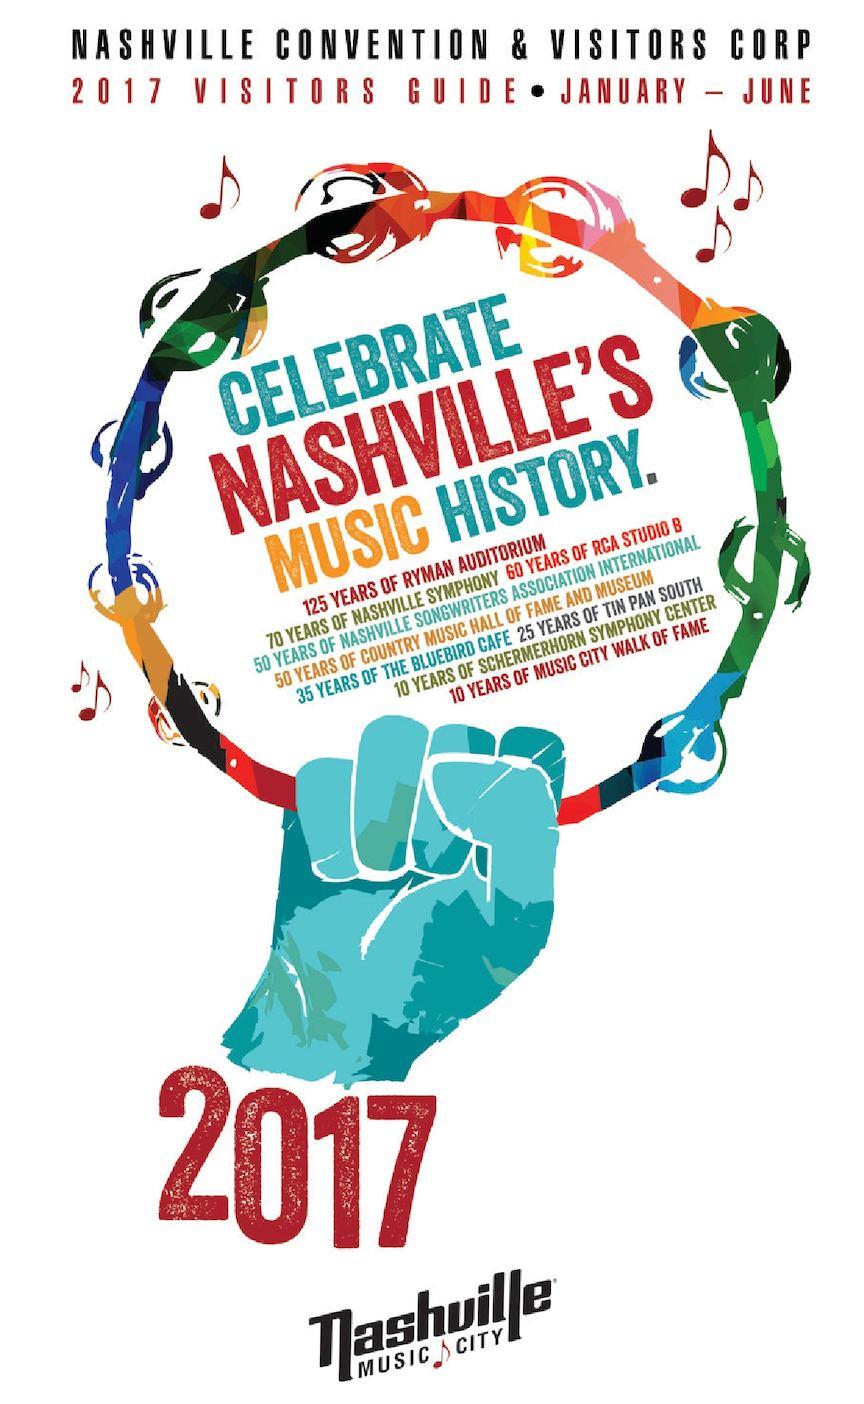 b51b886c743 Calaméo - Nashville Visitors Guide Jan.-June 2017